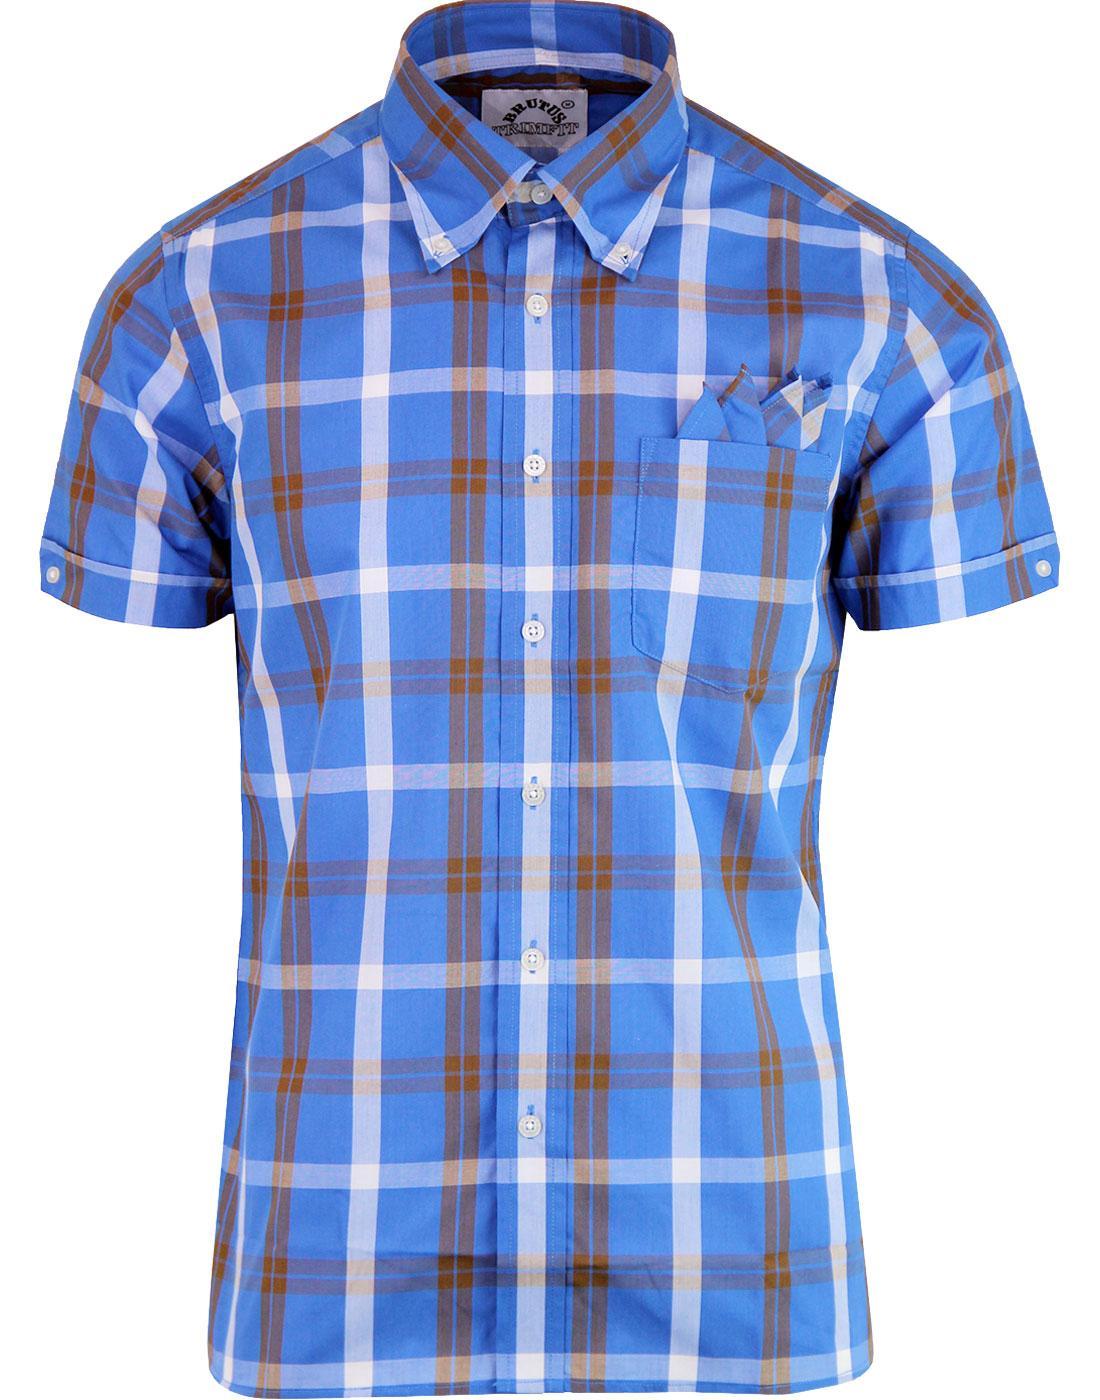 BRUTUS TRIMFIT Men's Mod Window Pane Check Shirt B